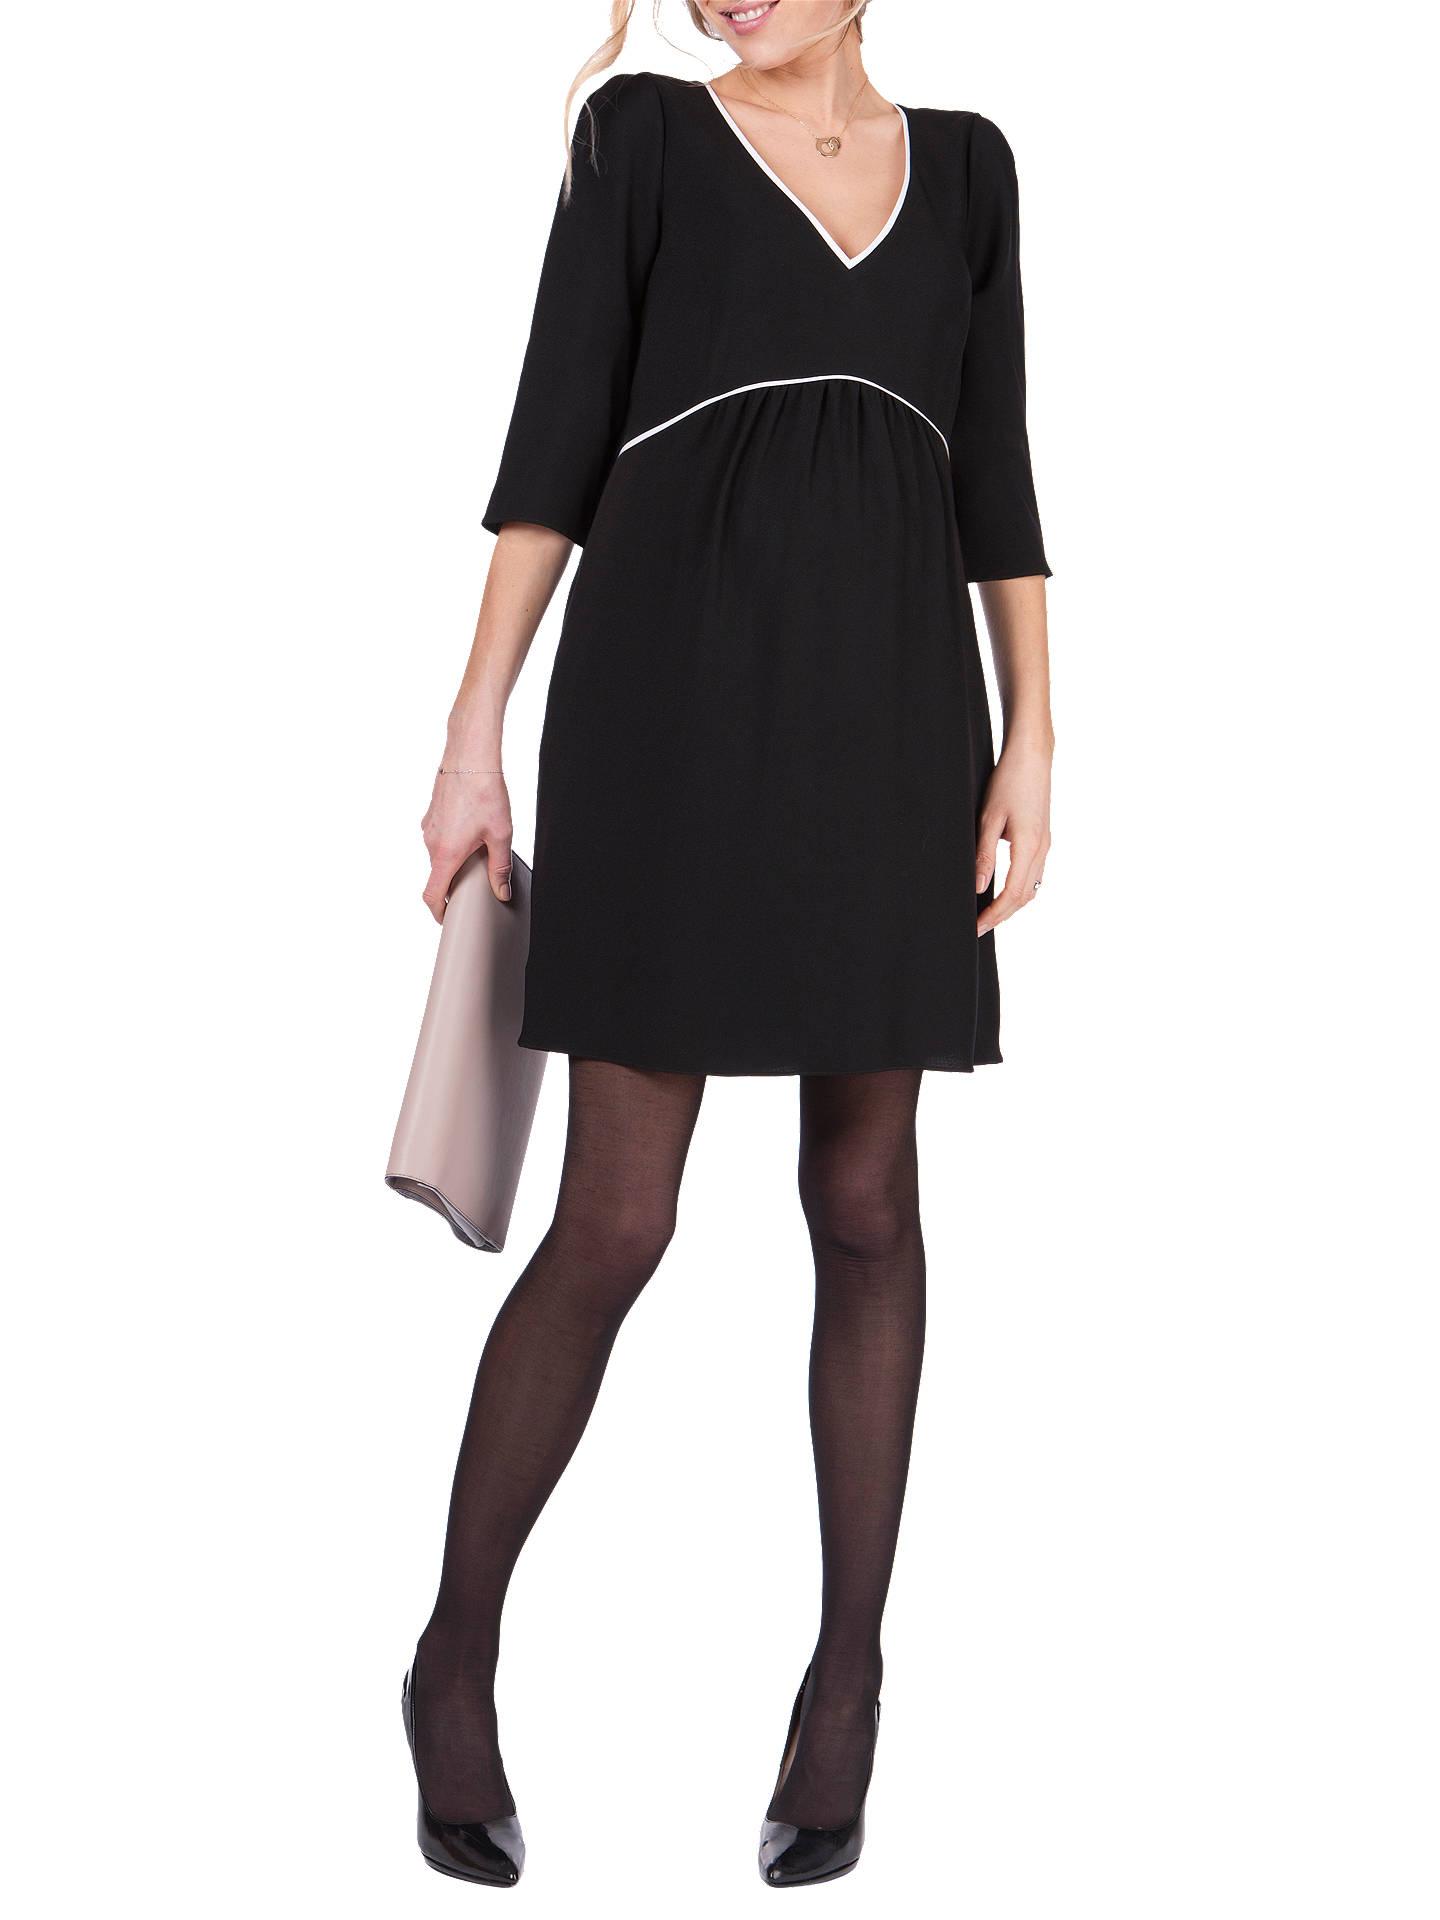 10932fcda40c1 Buy Séraphine Charlotte V Neck Maternity Dress, Black, 8 Online at  johnlewis.com ...